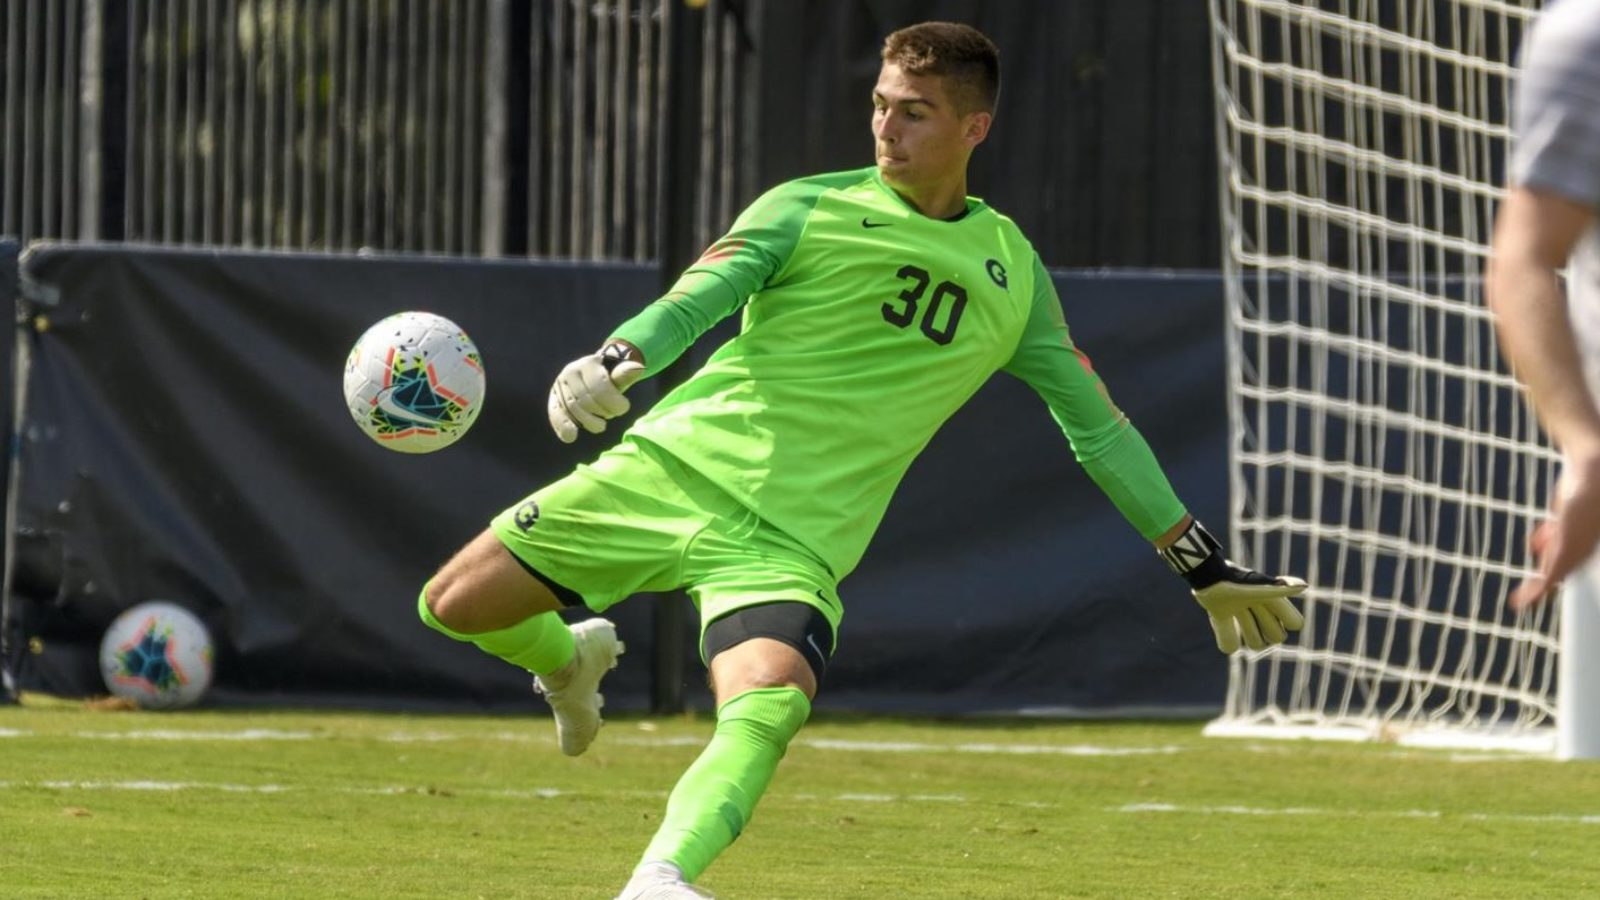 Tomas Romero kicking a soccer ball